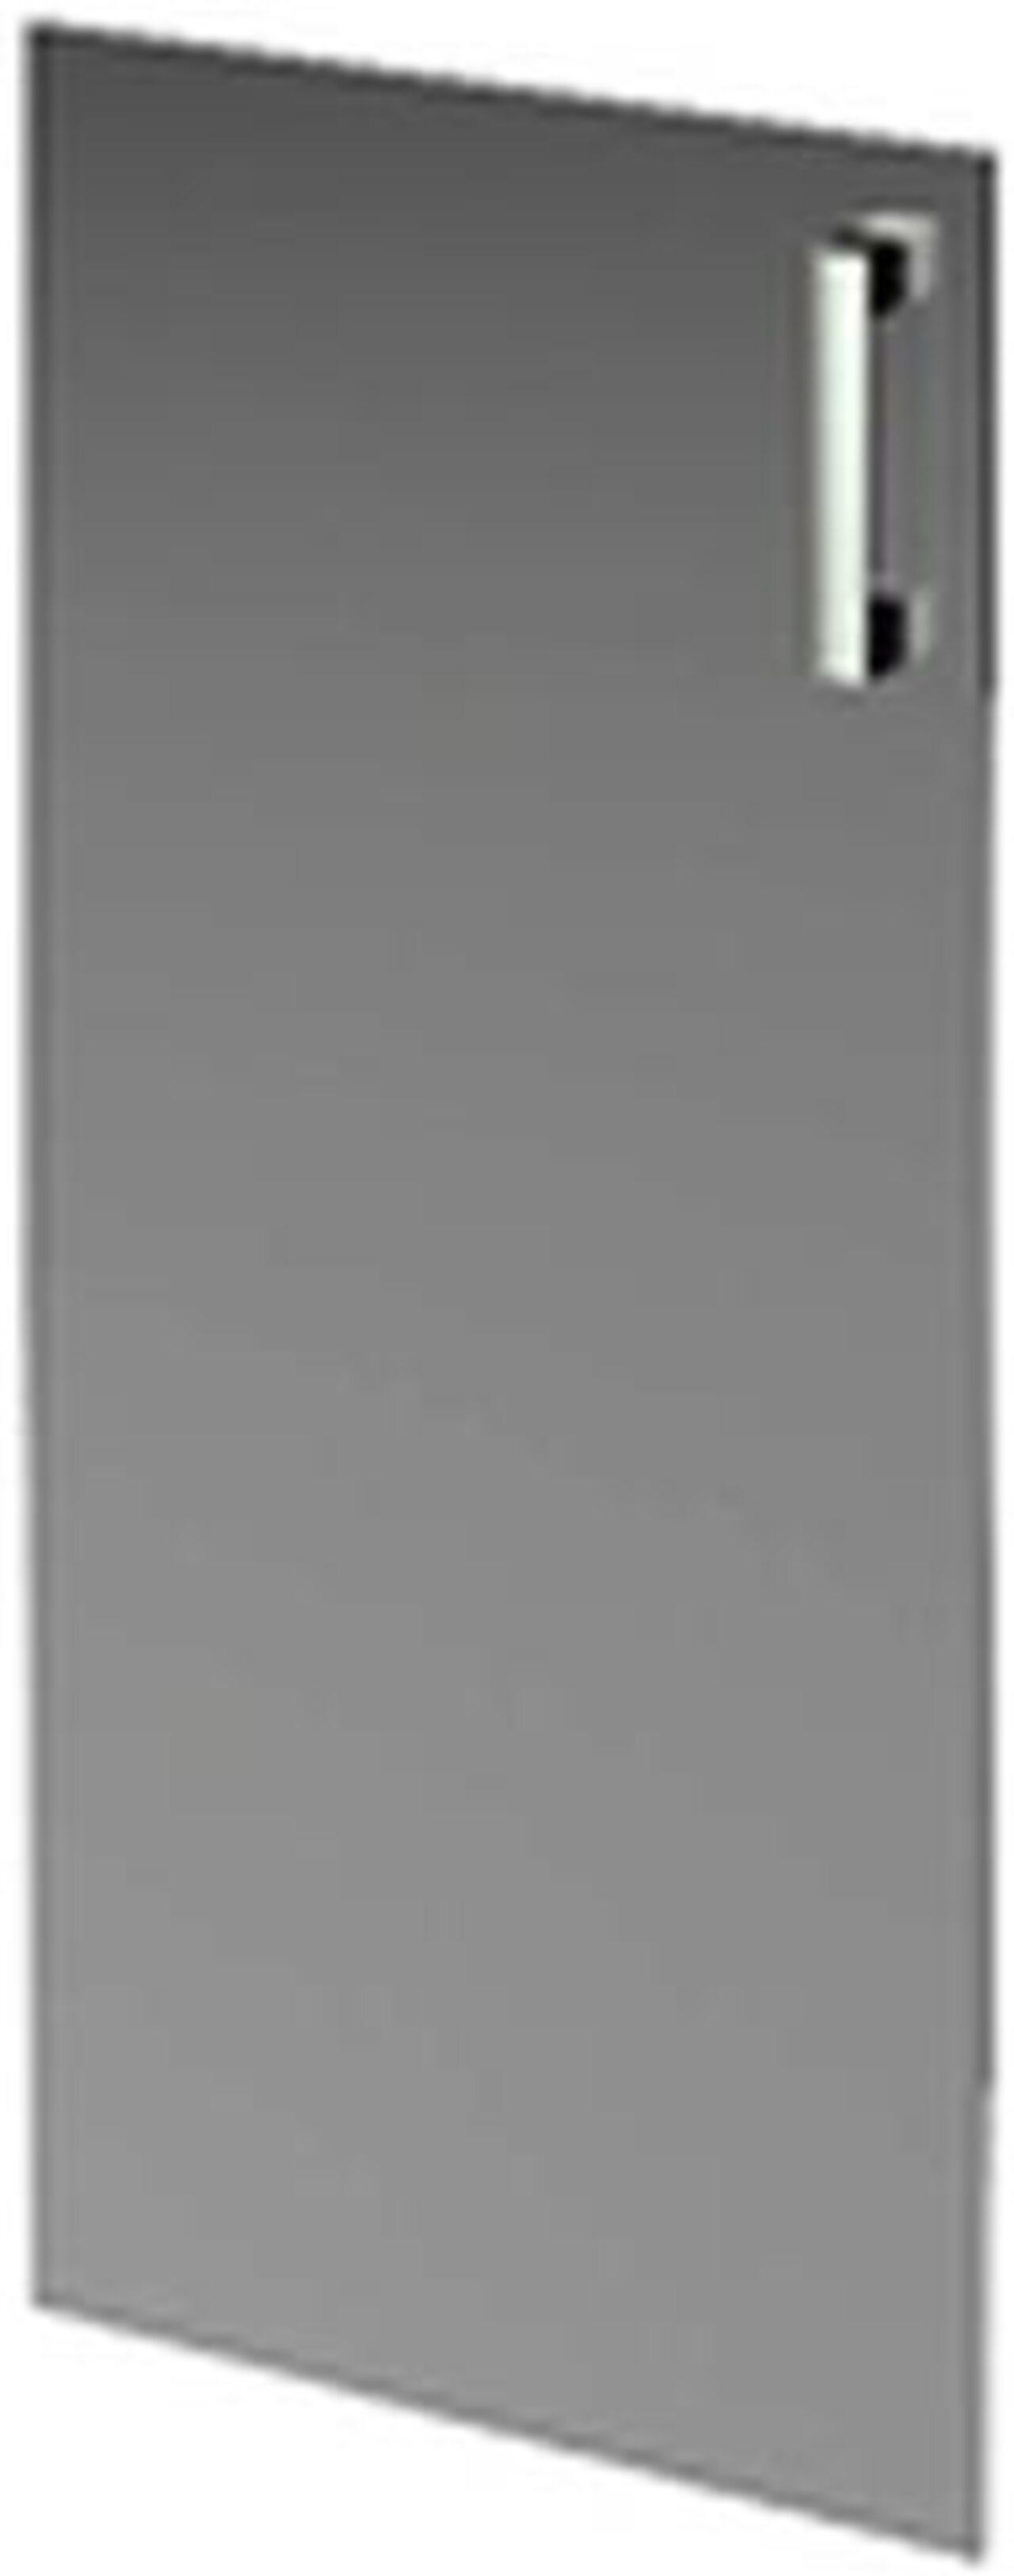 Дверь средняя стеклянная  Аргентум 39x1x118 - фото 7